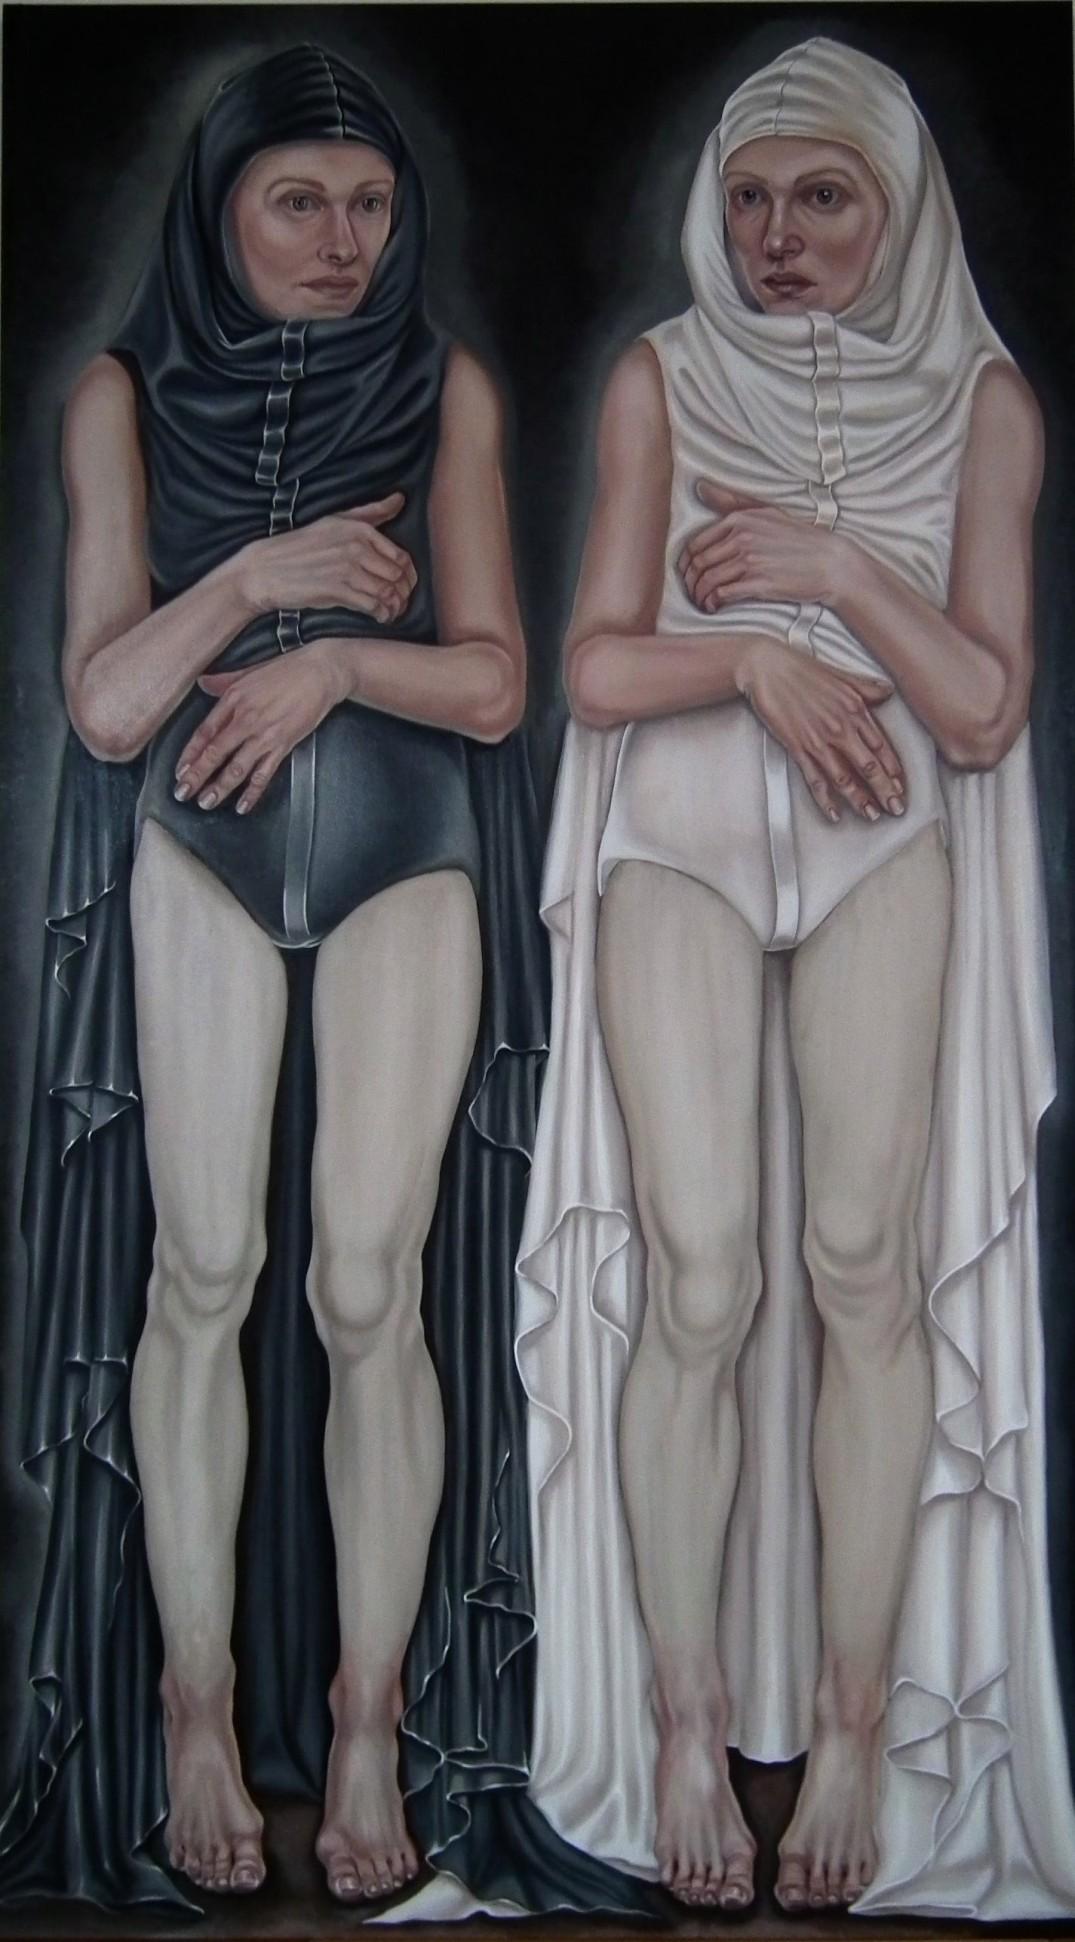 28. z cyklu Hidden children - hidden mothers, 2019, olej, płótno, 160x90 cm